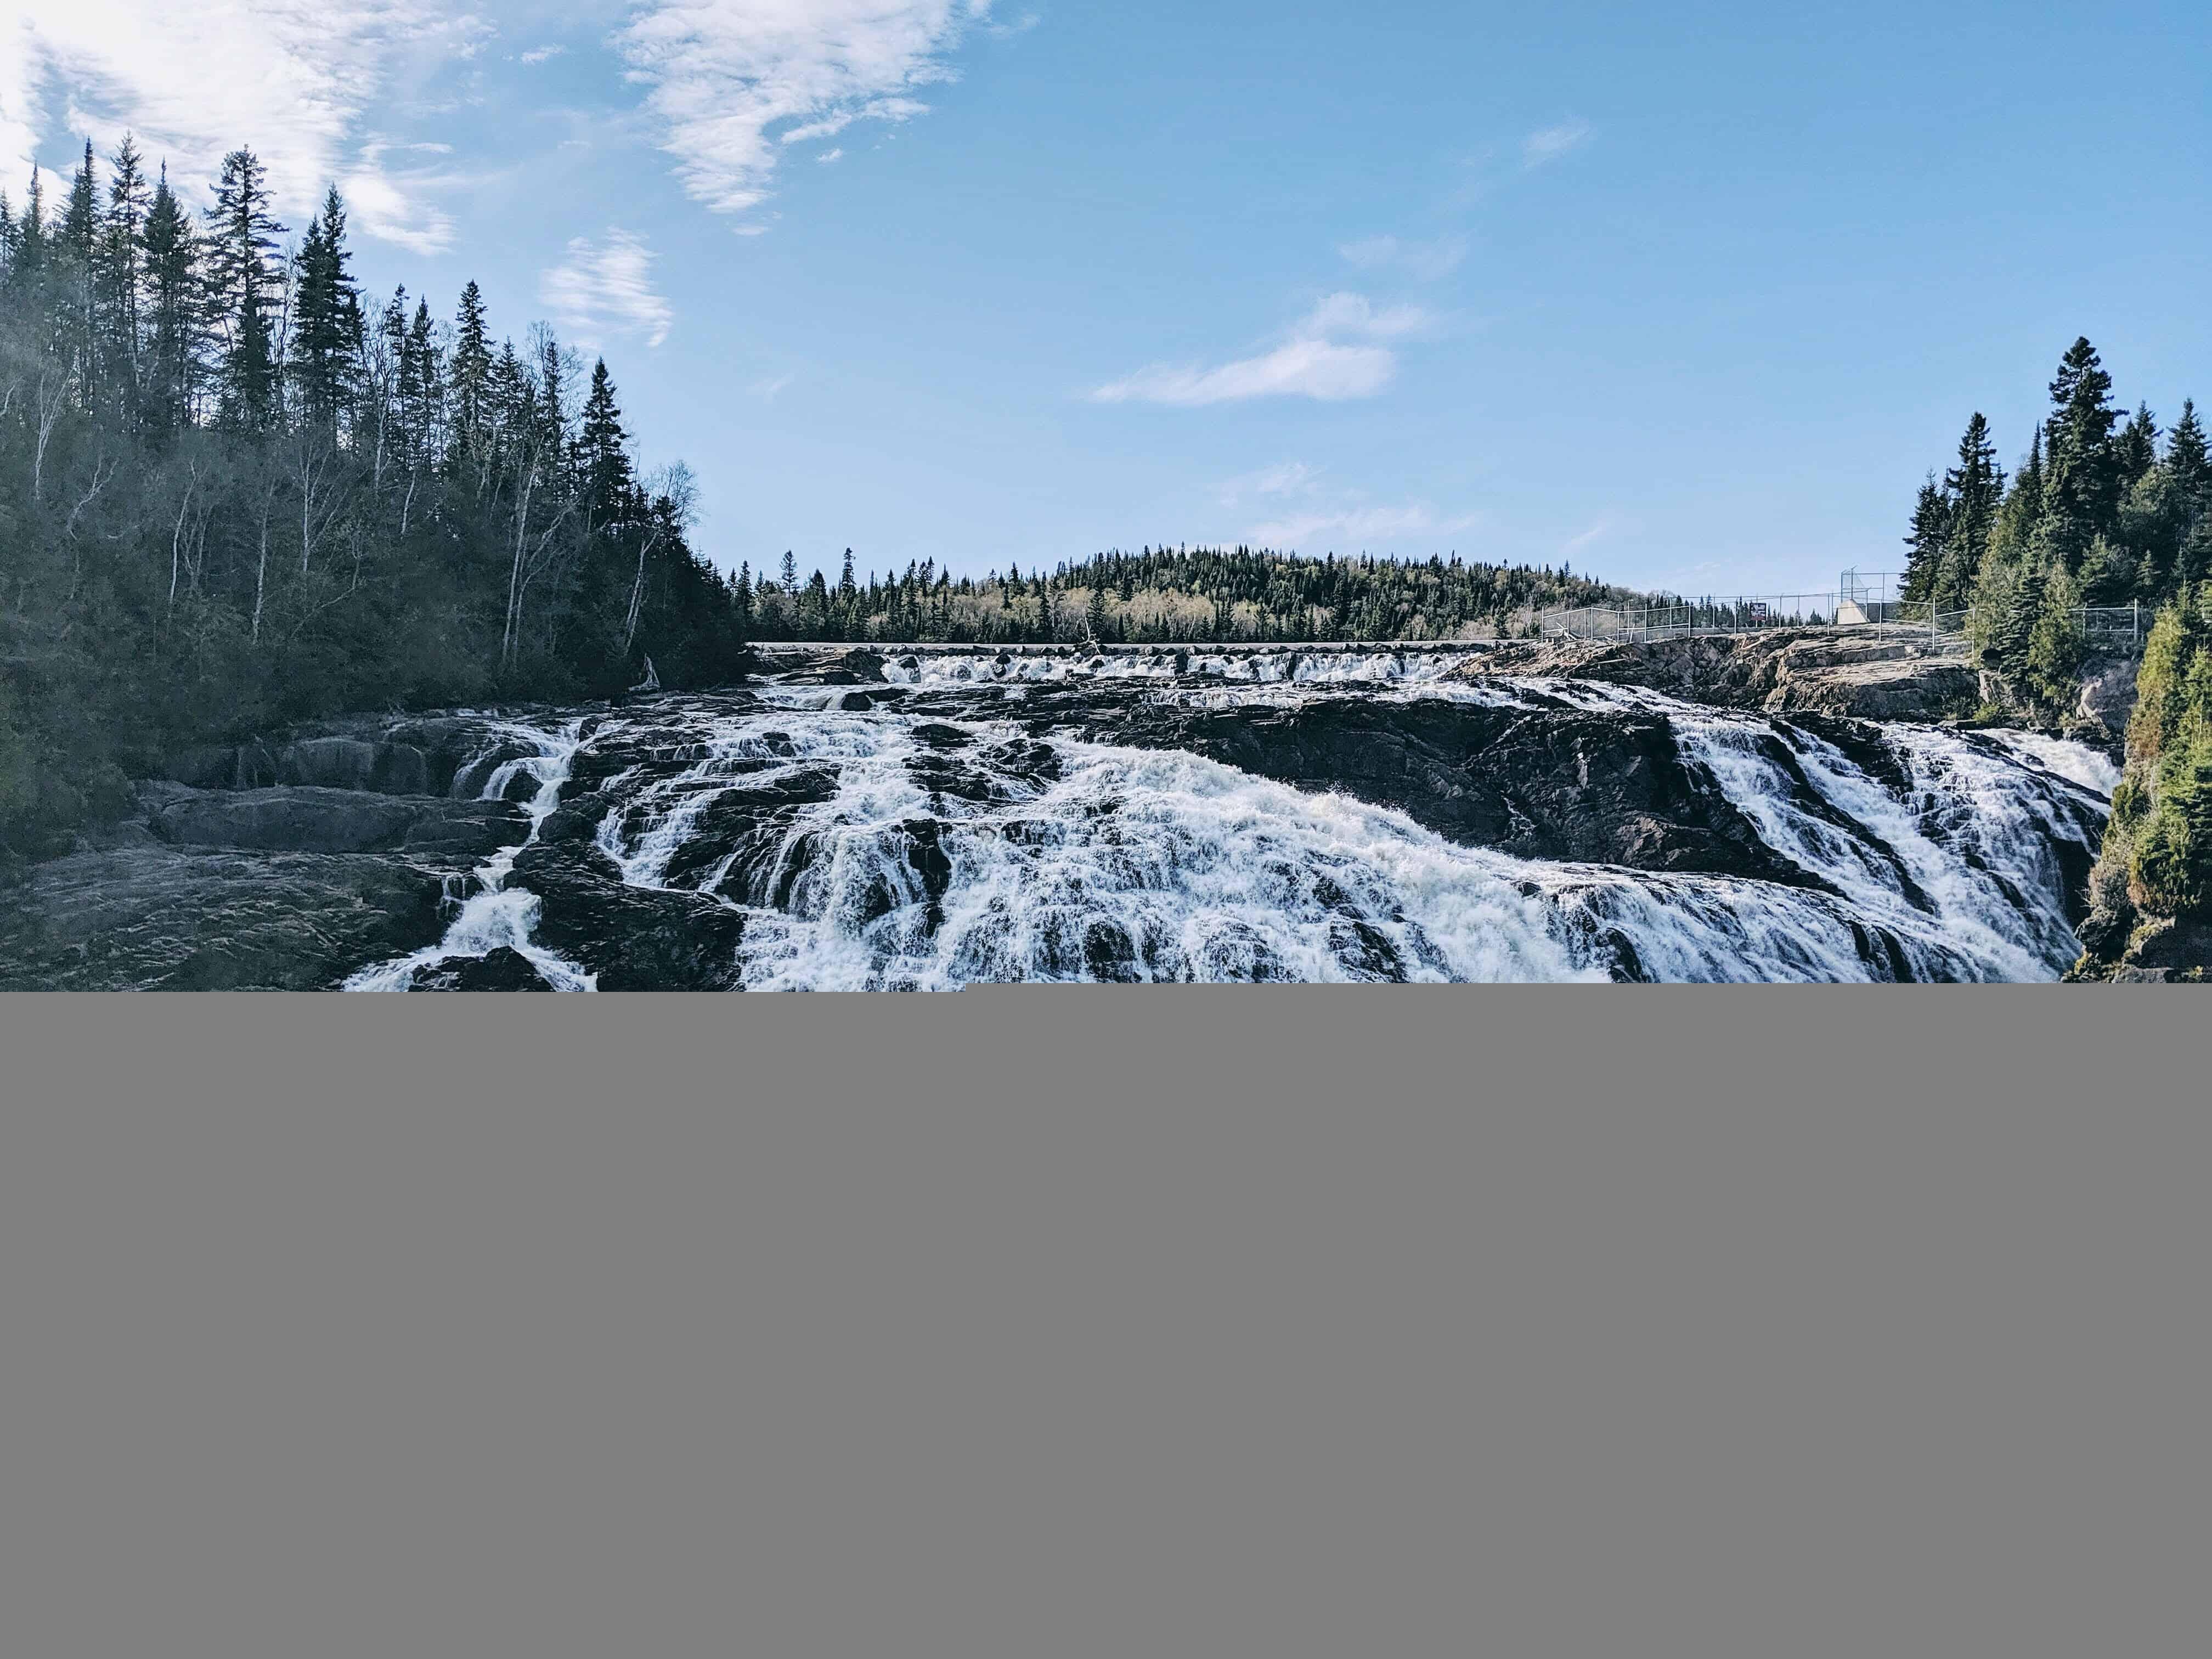 582E8076 1140 442D AA31 813142F0103F Our Lake Superior Circle Tour   #MittenTrip